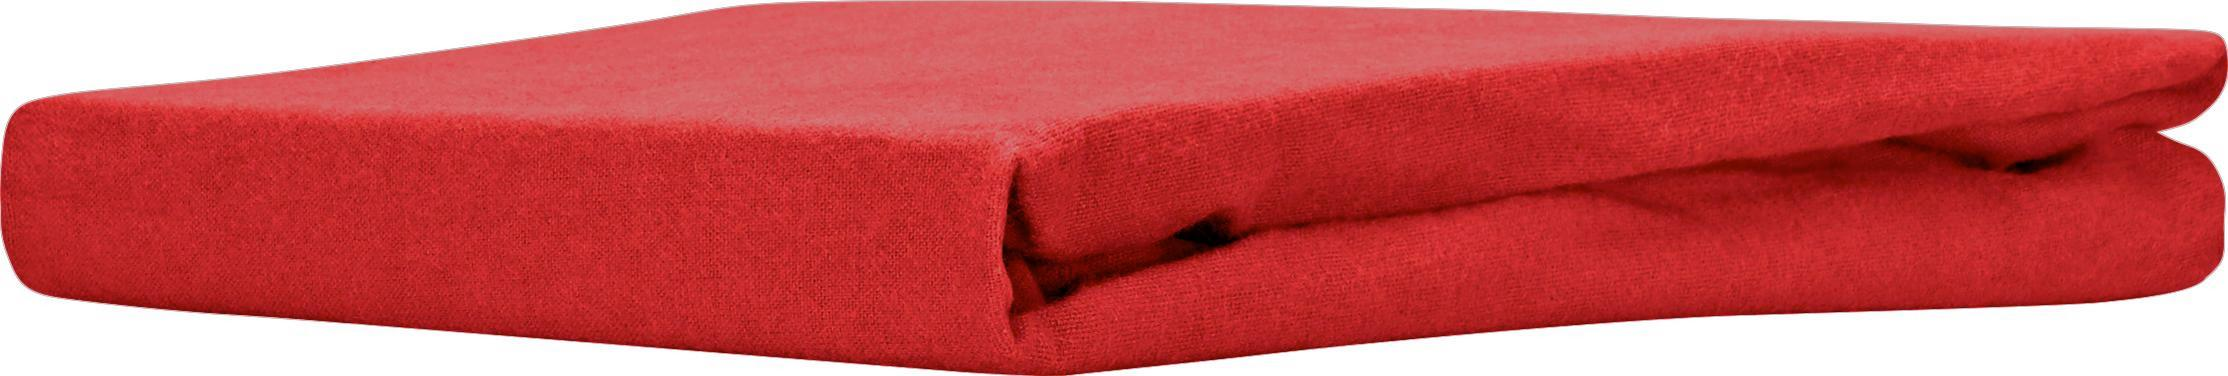 Spannleintuch aus Baumwoll-Flanell in Rot